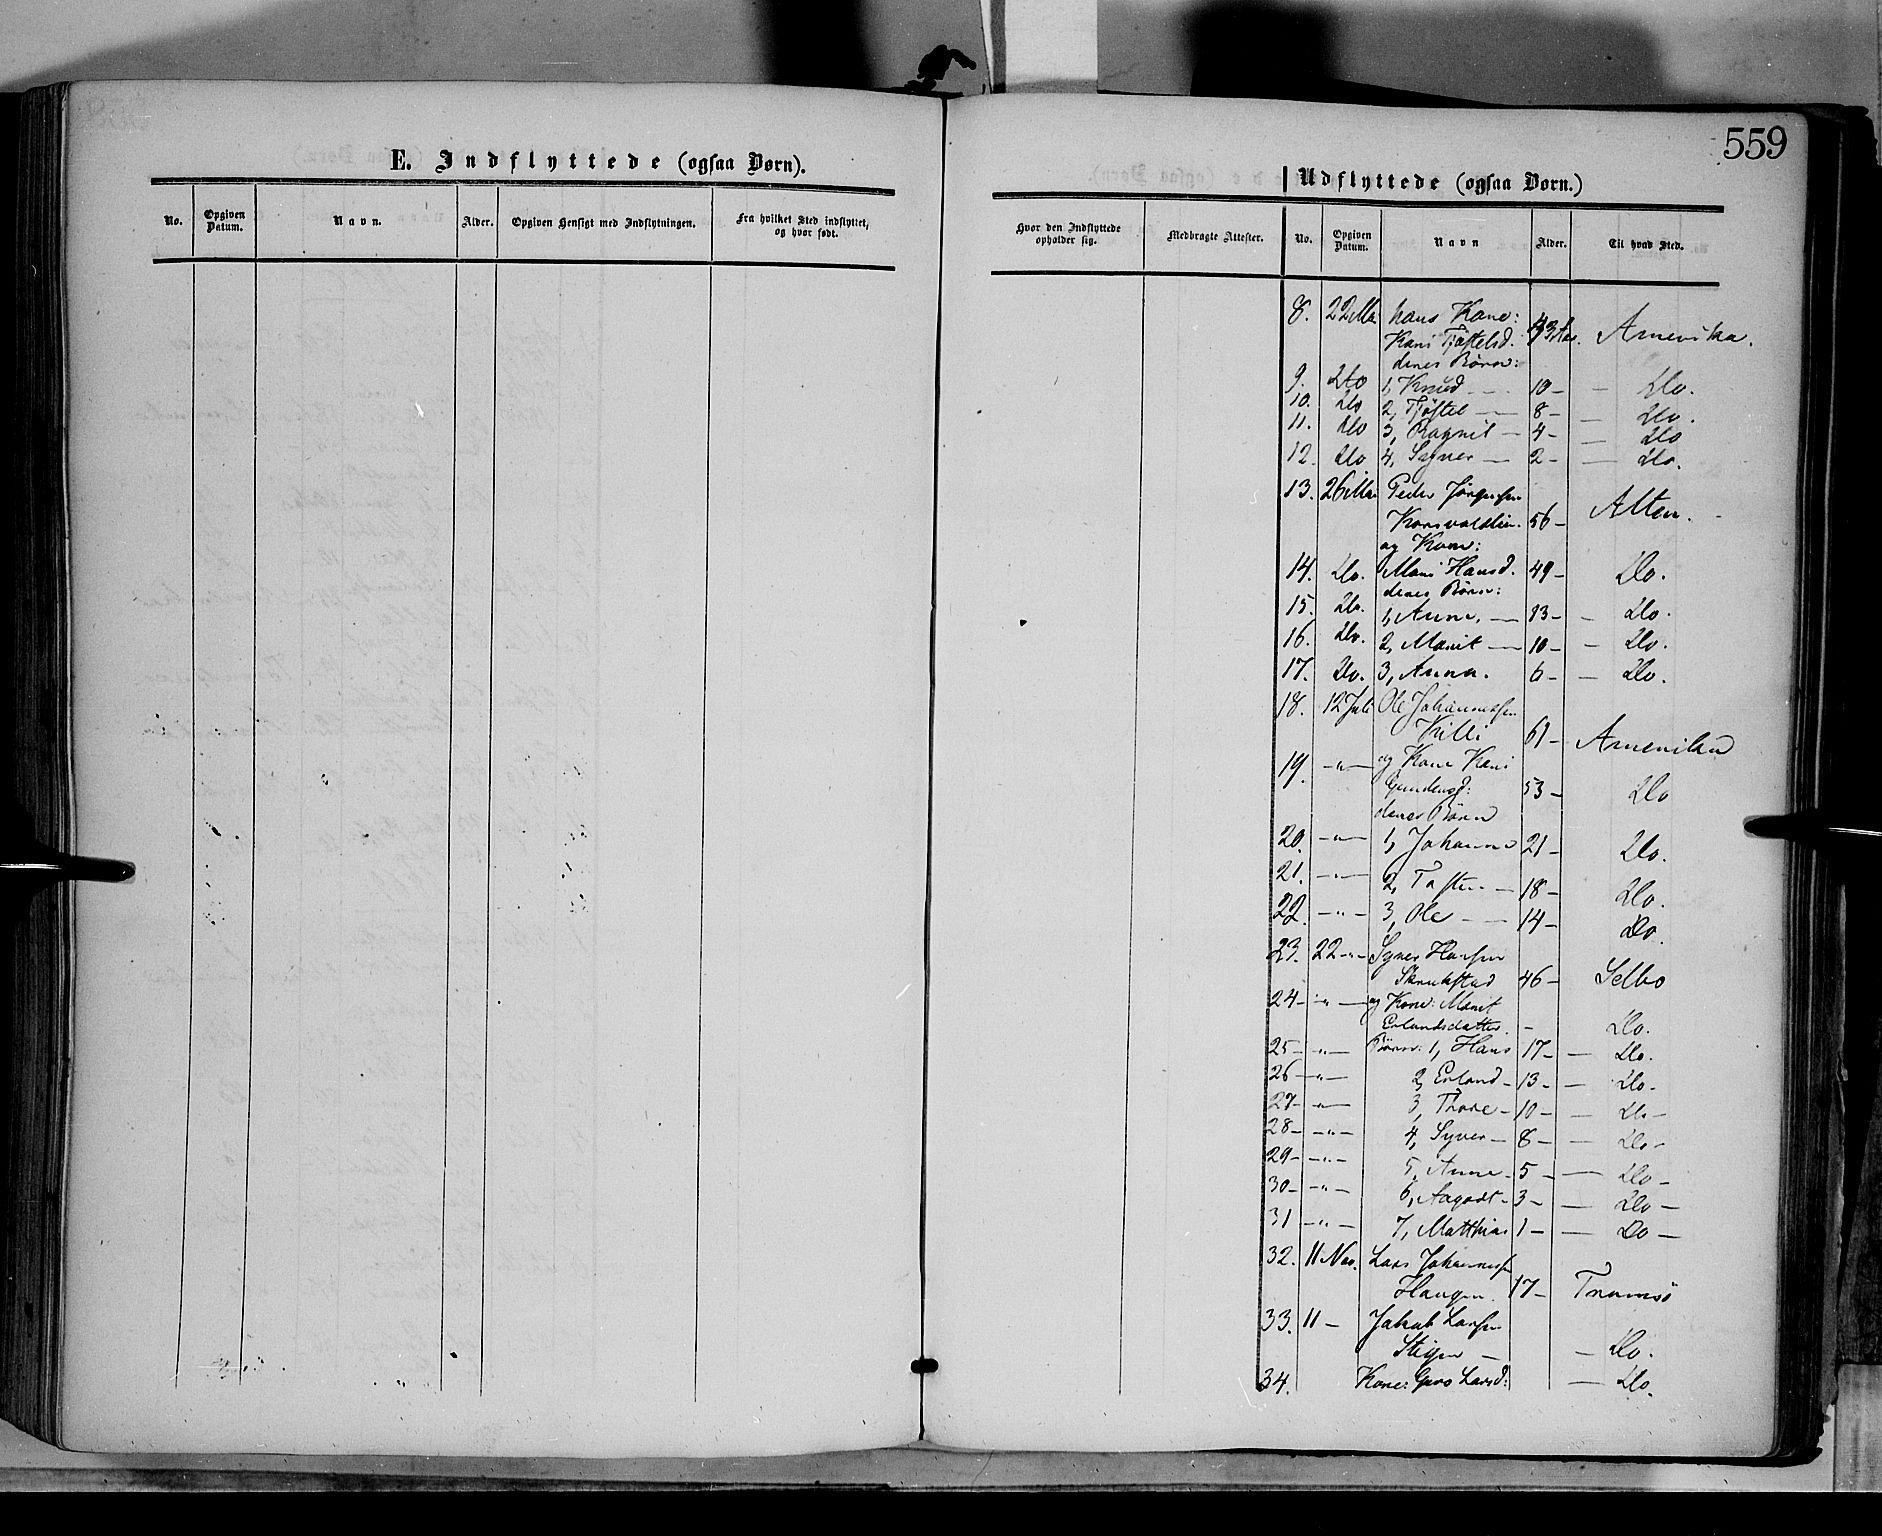 SAH, Dovre prestekontor, Ministerialbok nr. 1, 1854-1878, s. 559